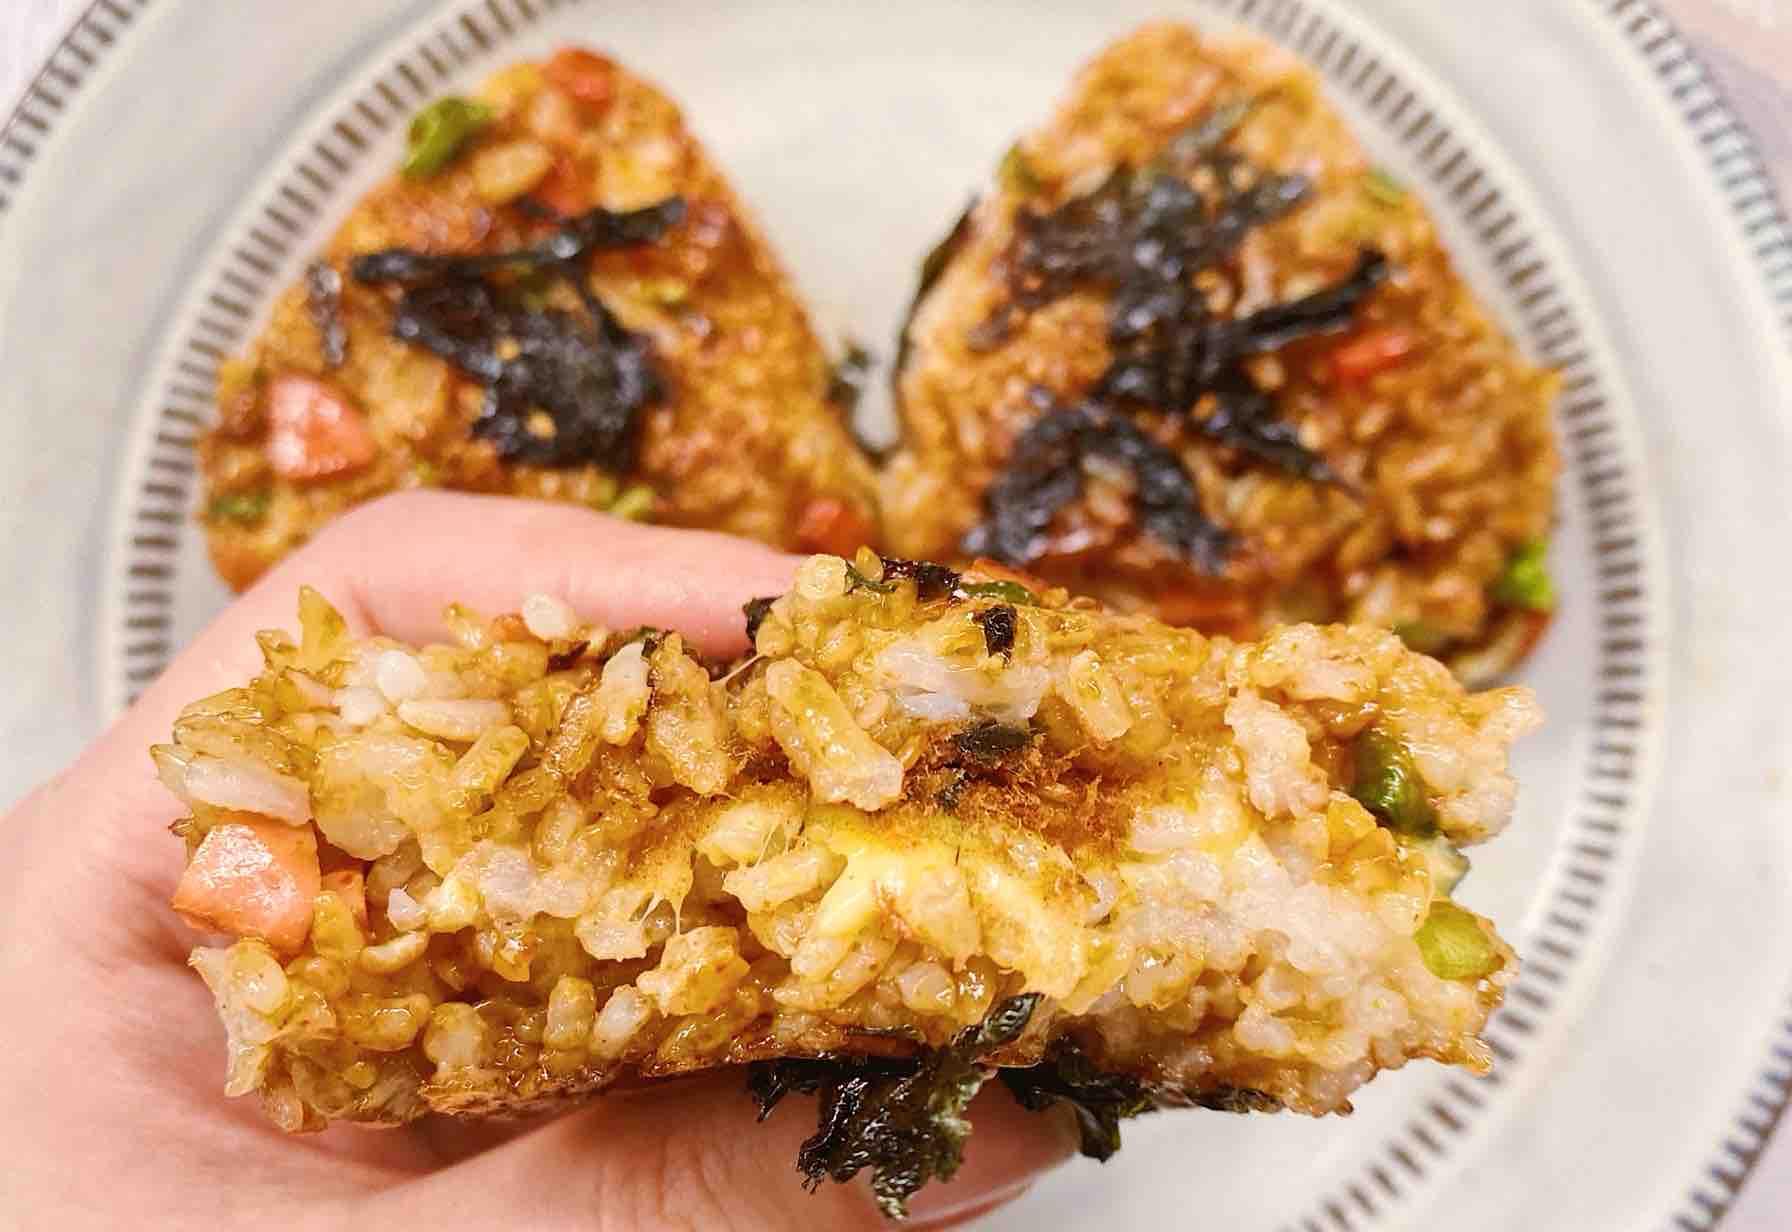 ㊙️米饭的神仙吃法|日式芝士饭团成品图